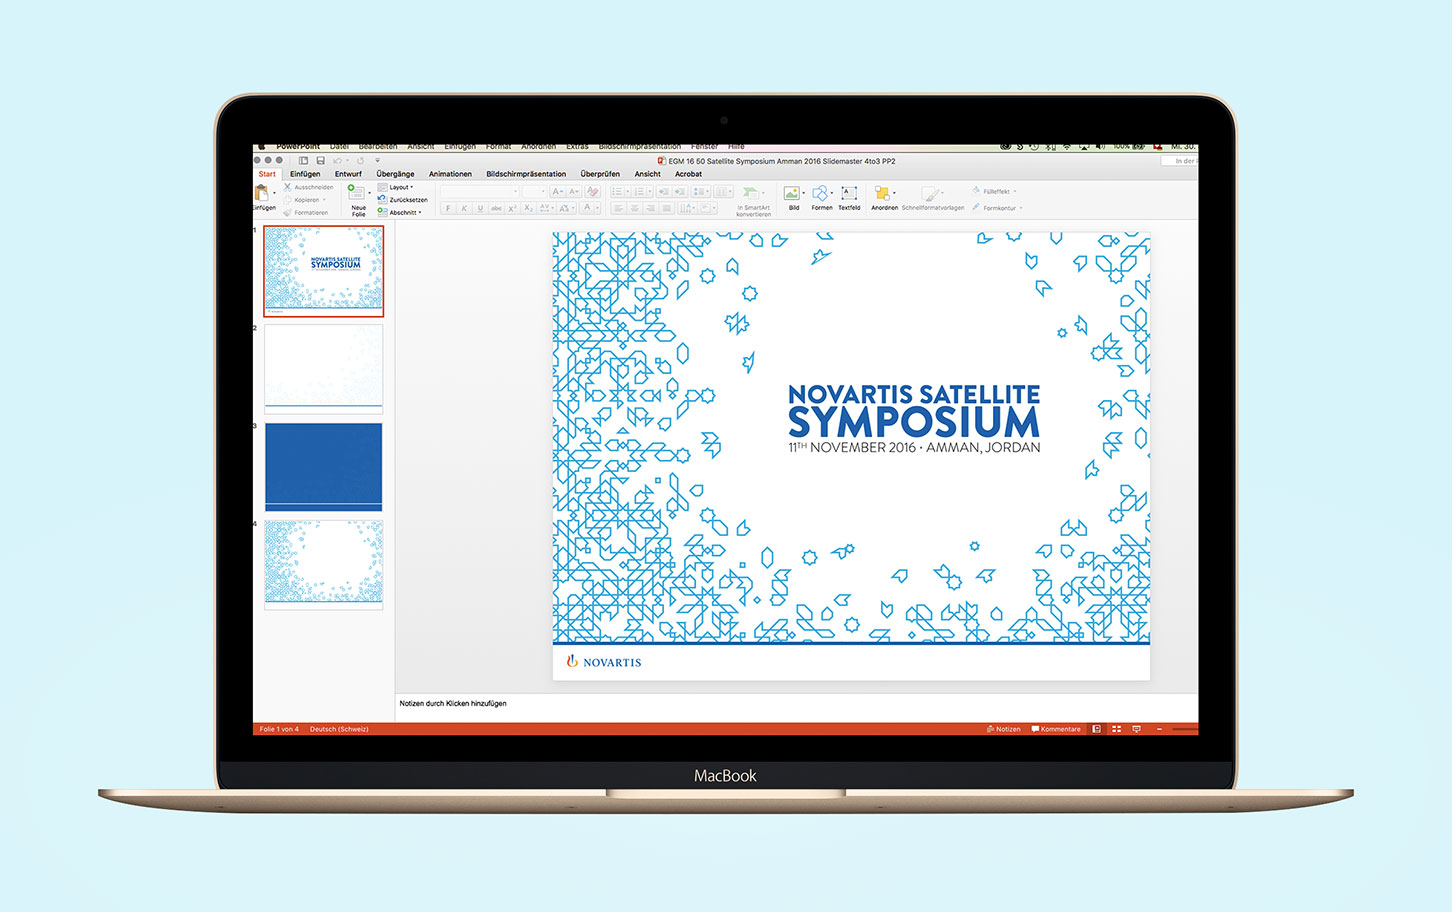 Novartis Satellite Symposium - KUP Werbeagentur